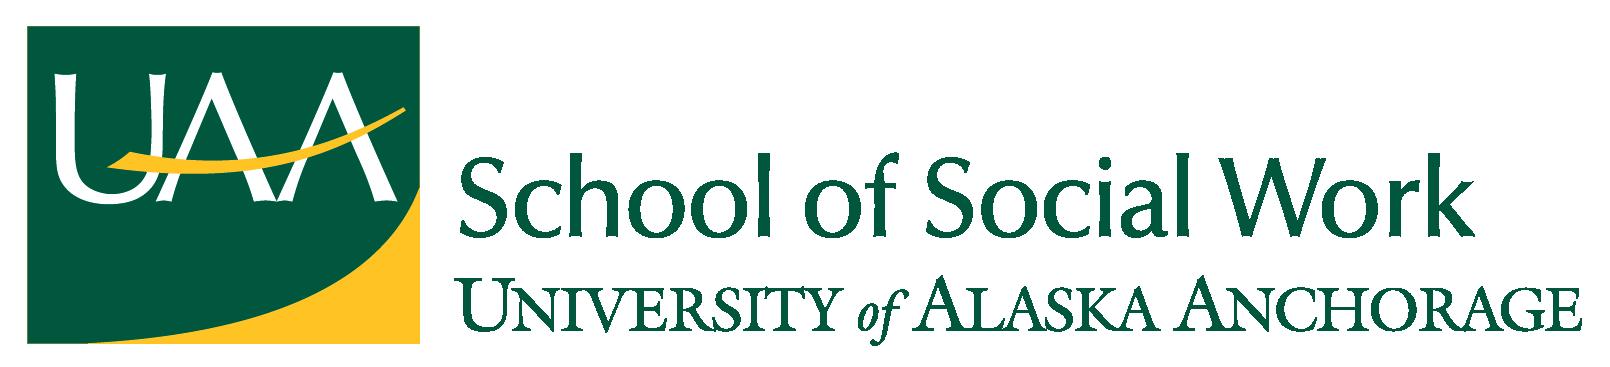 UAA School of Social Work logo